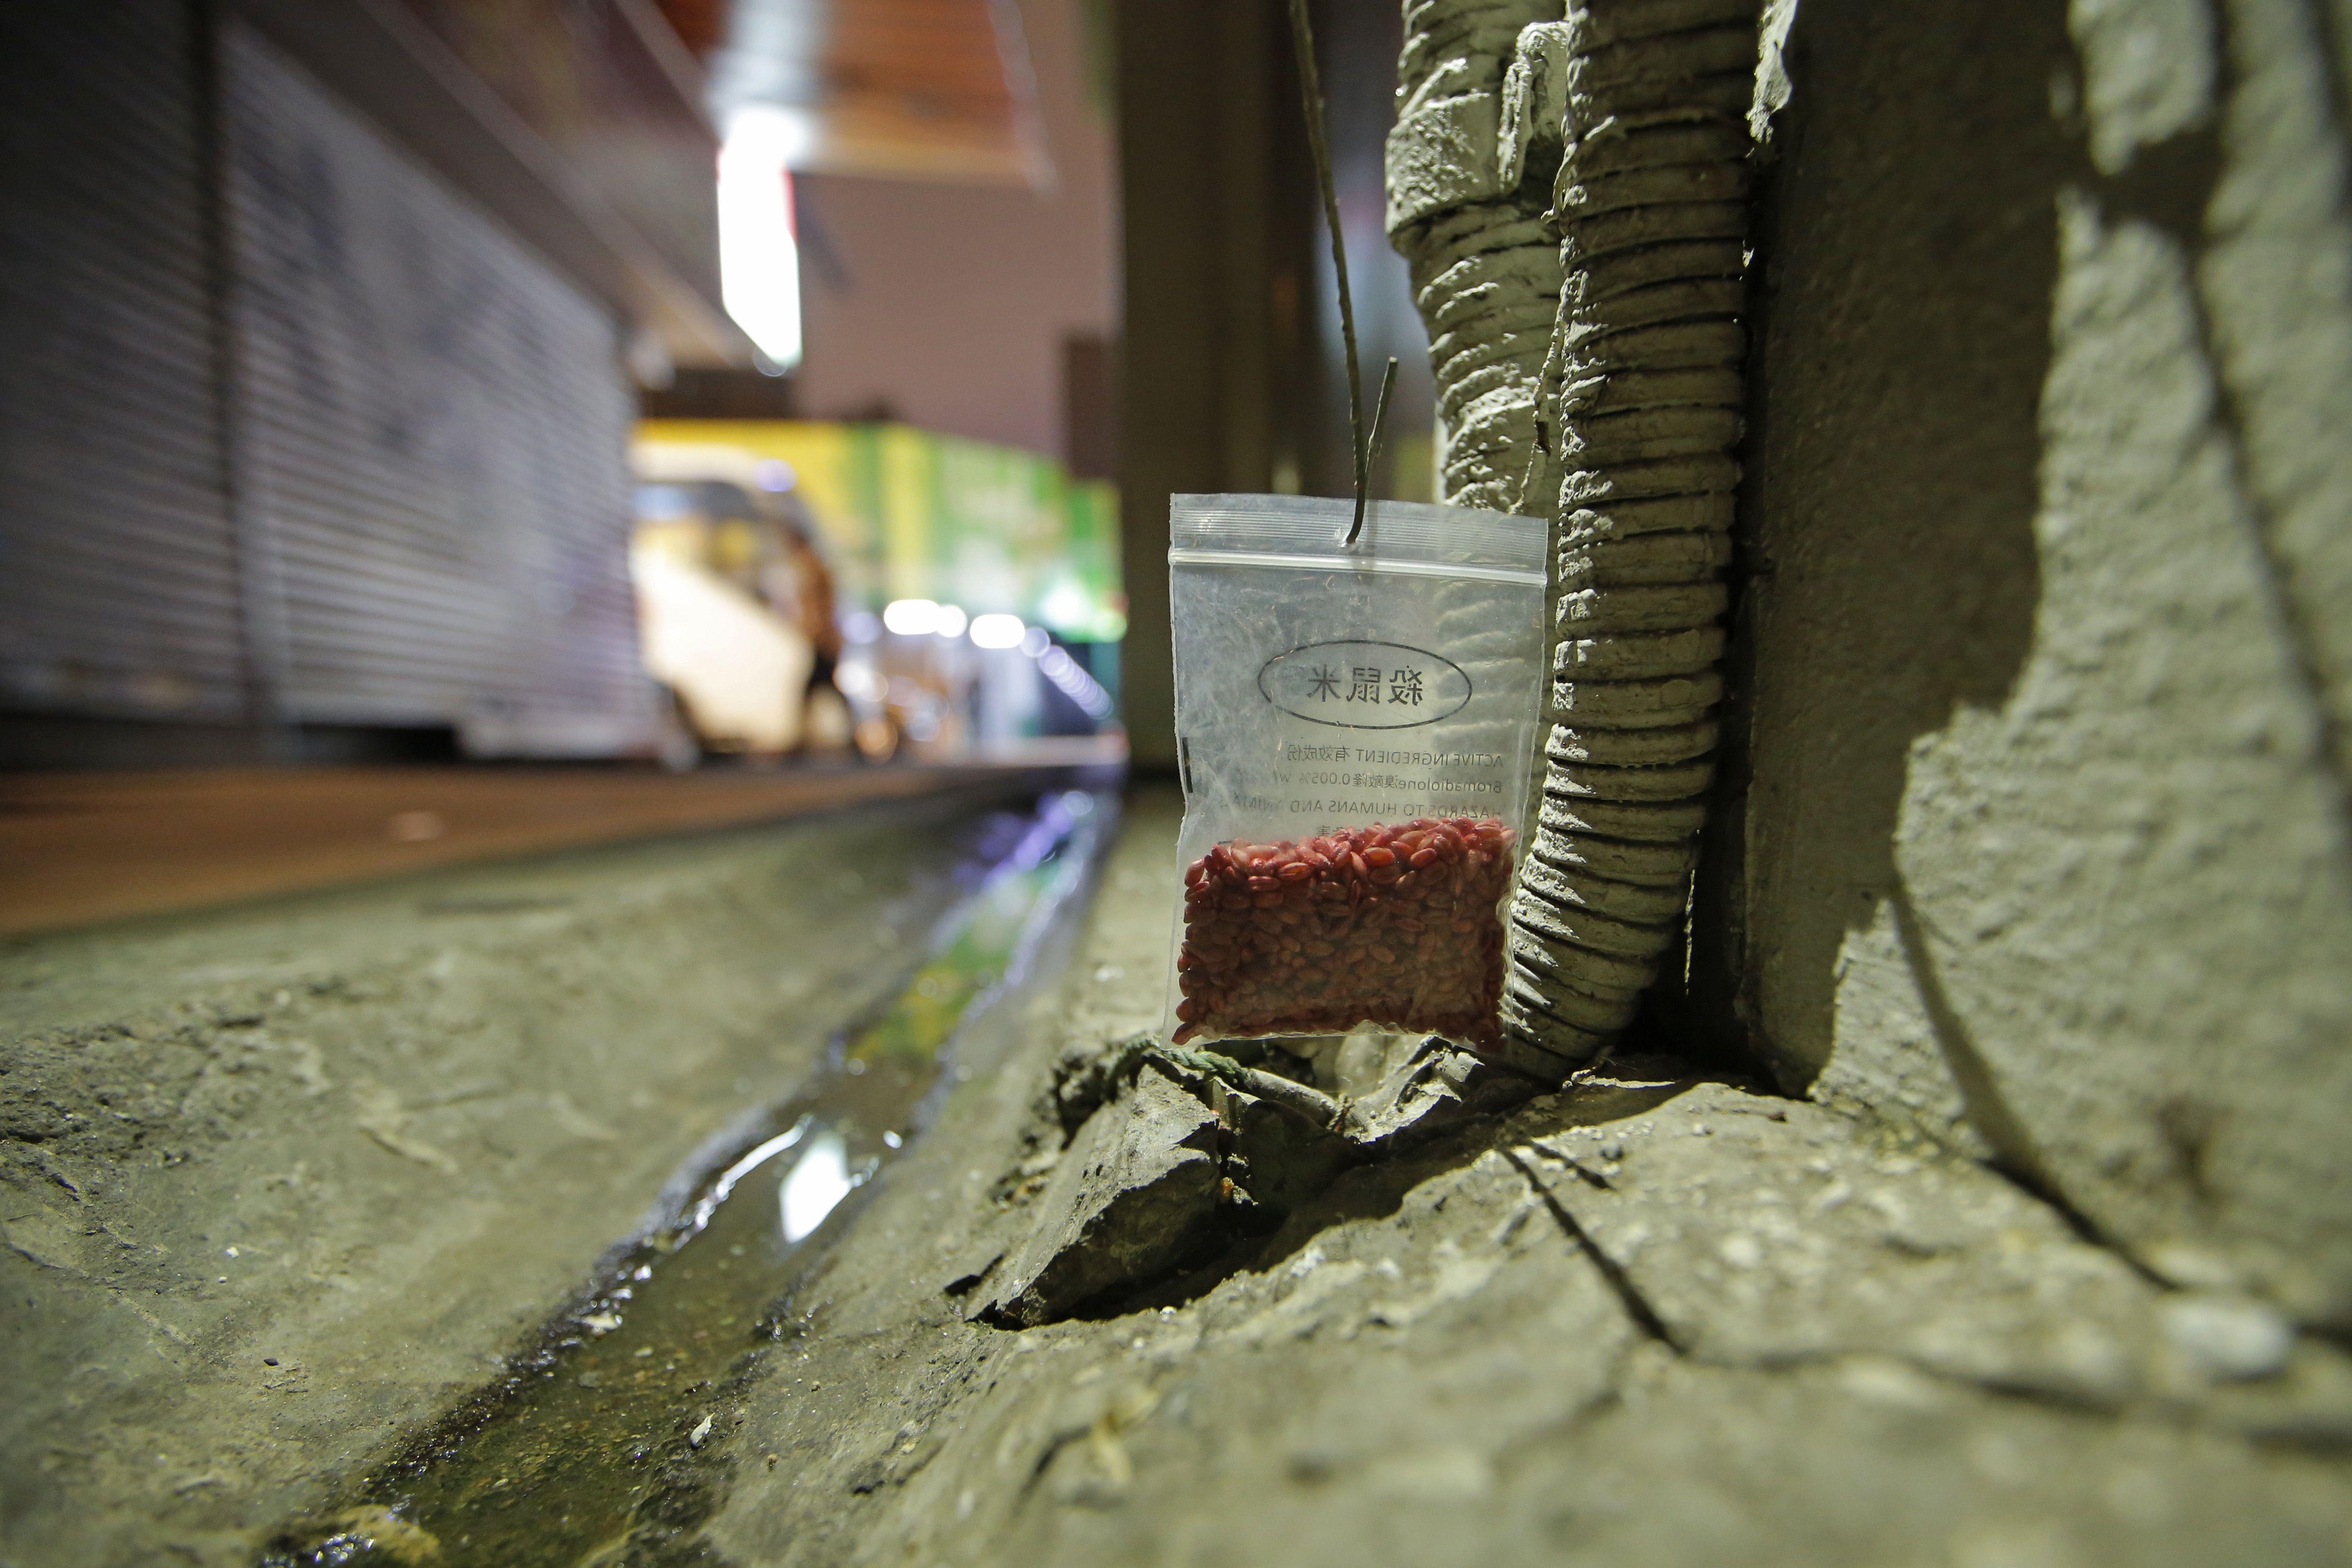 Щури в Гонконзі, щурячий гепатит_2